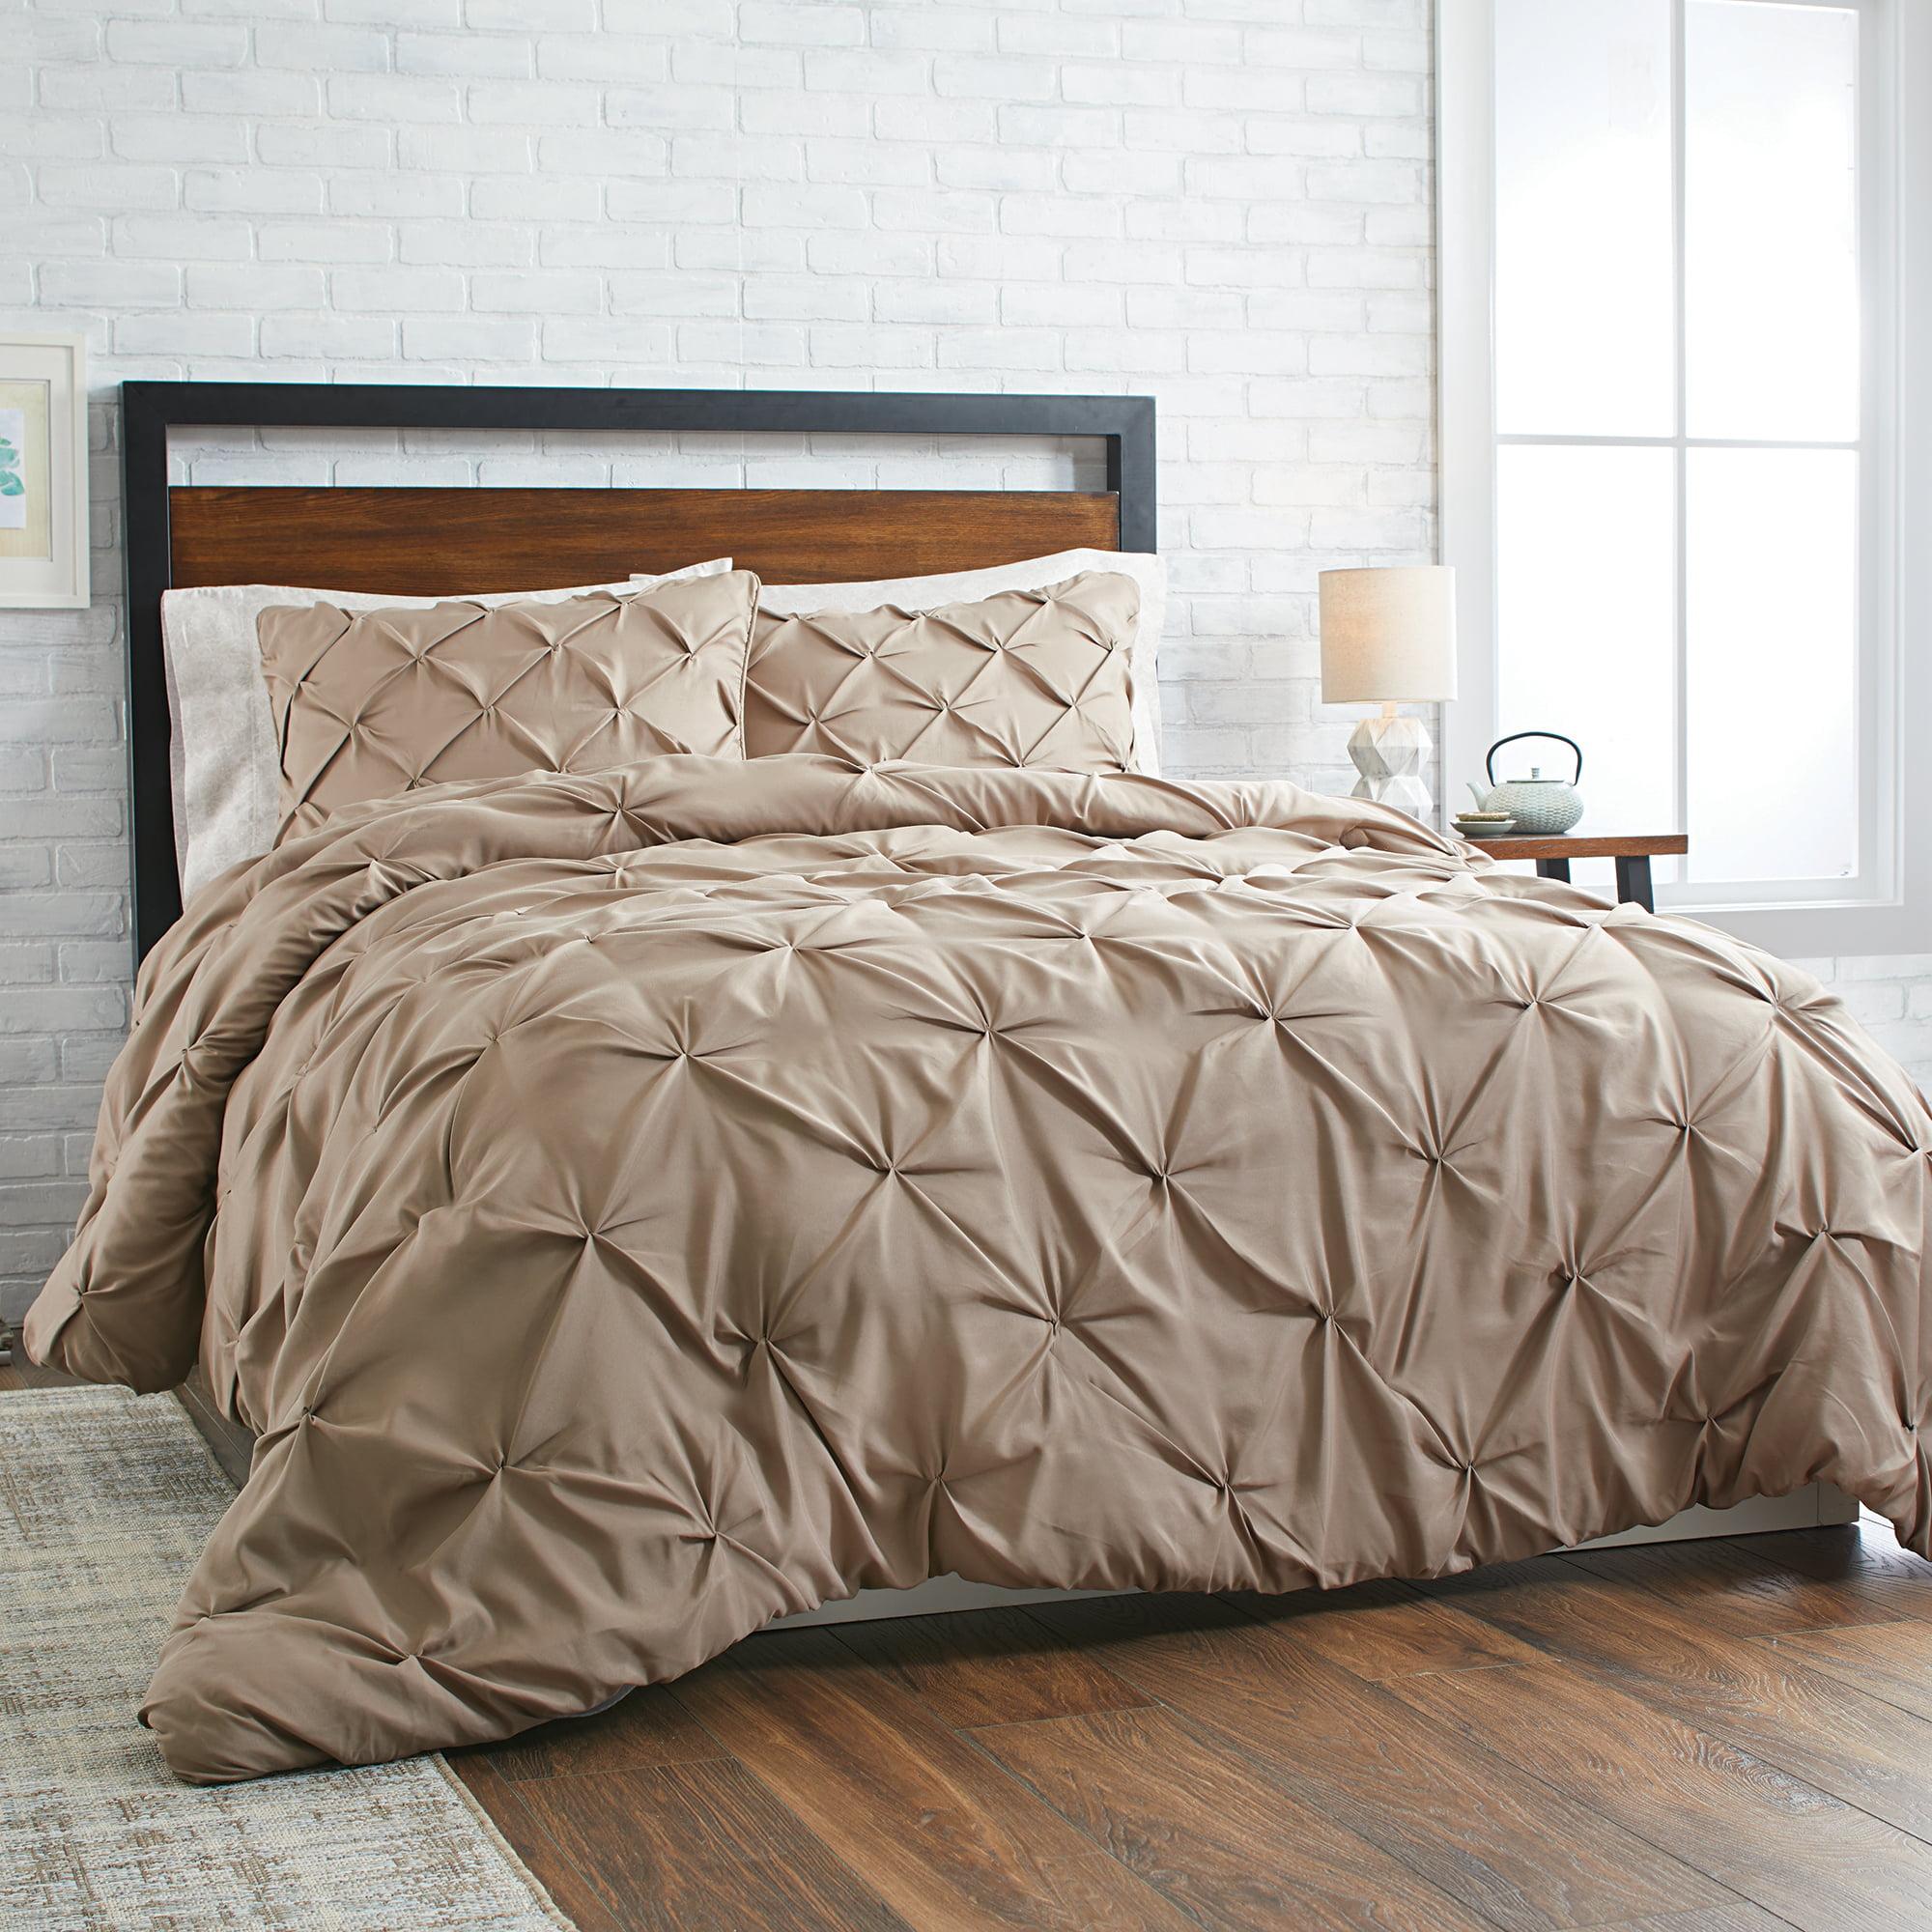 Tufted bedding queen 3 piece pintuck comforter set better - Better homes and gardens bedding ...